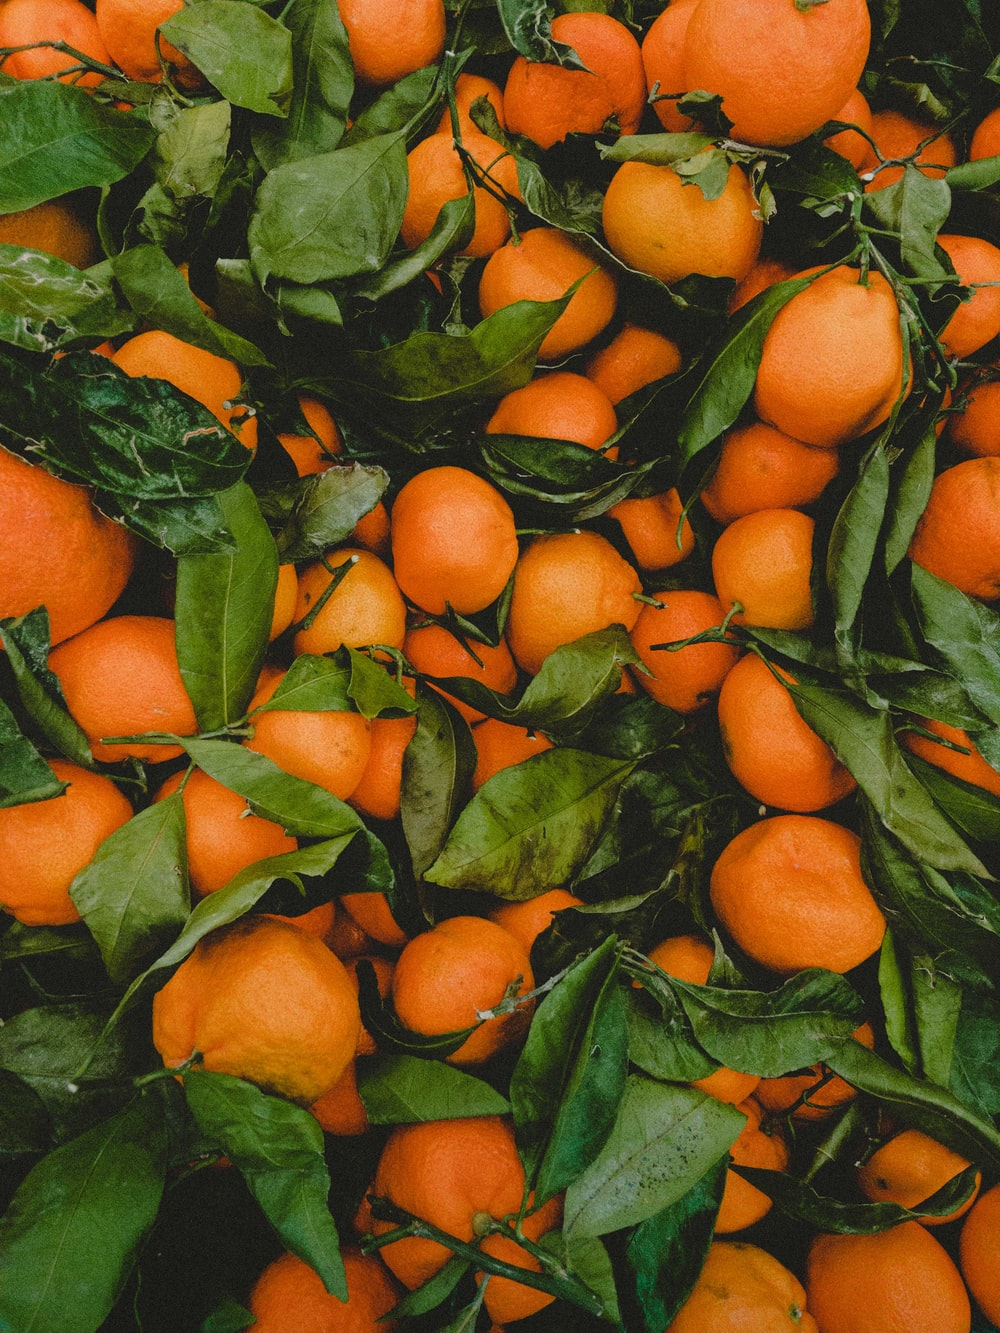 bunch of orange fruits